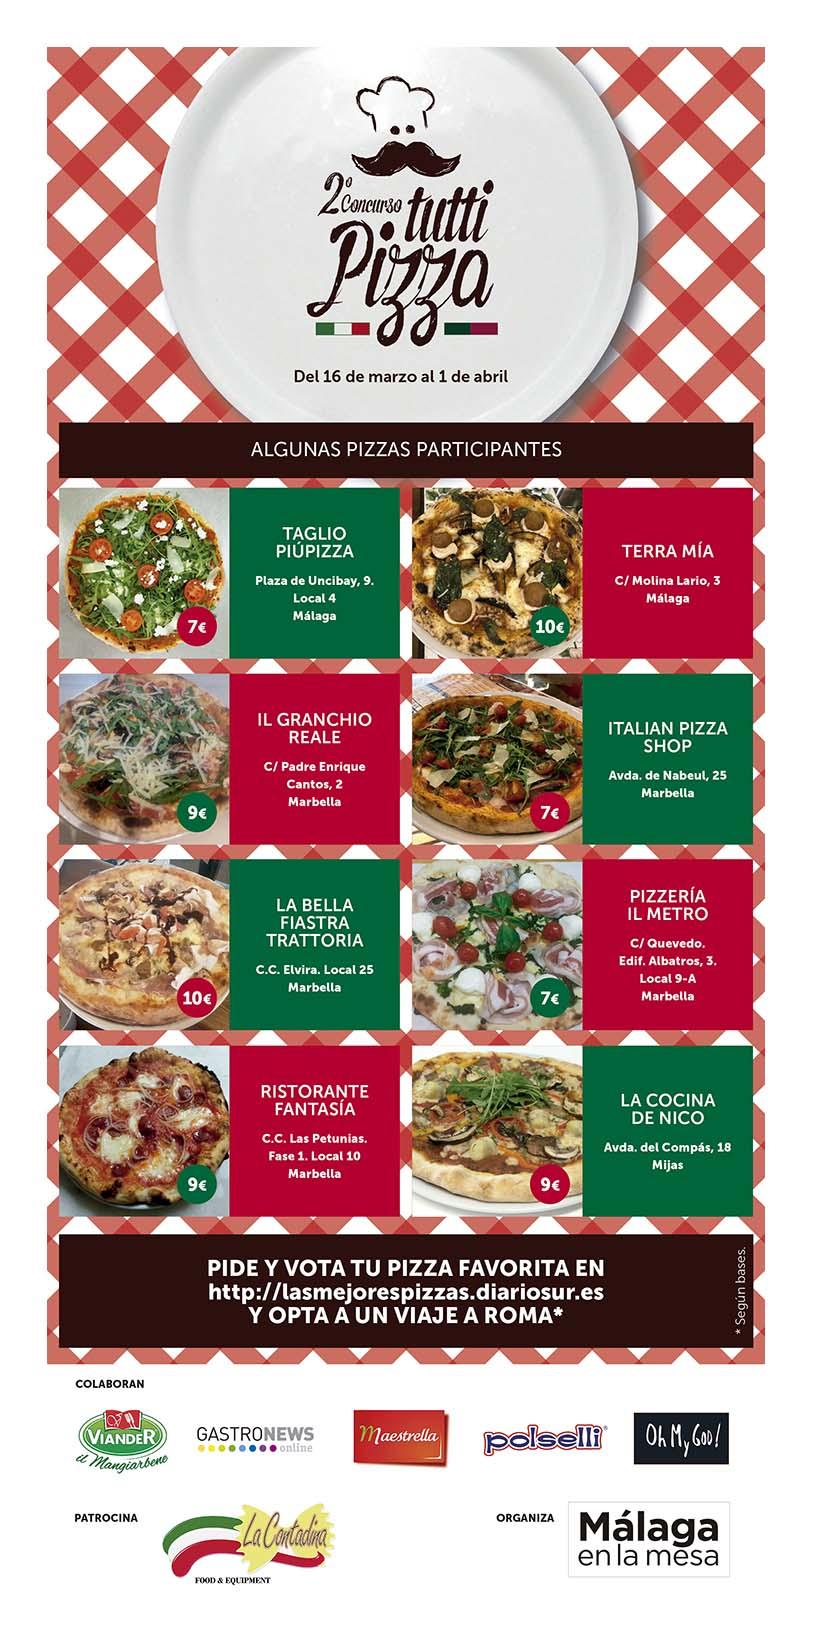 10x3 2TuttiPizza 03 - establecimientos4 final